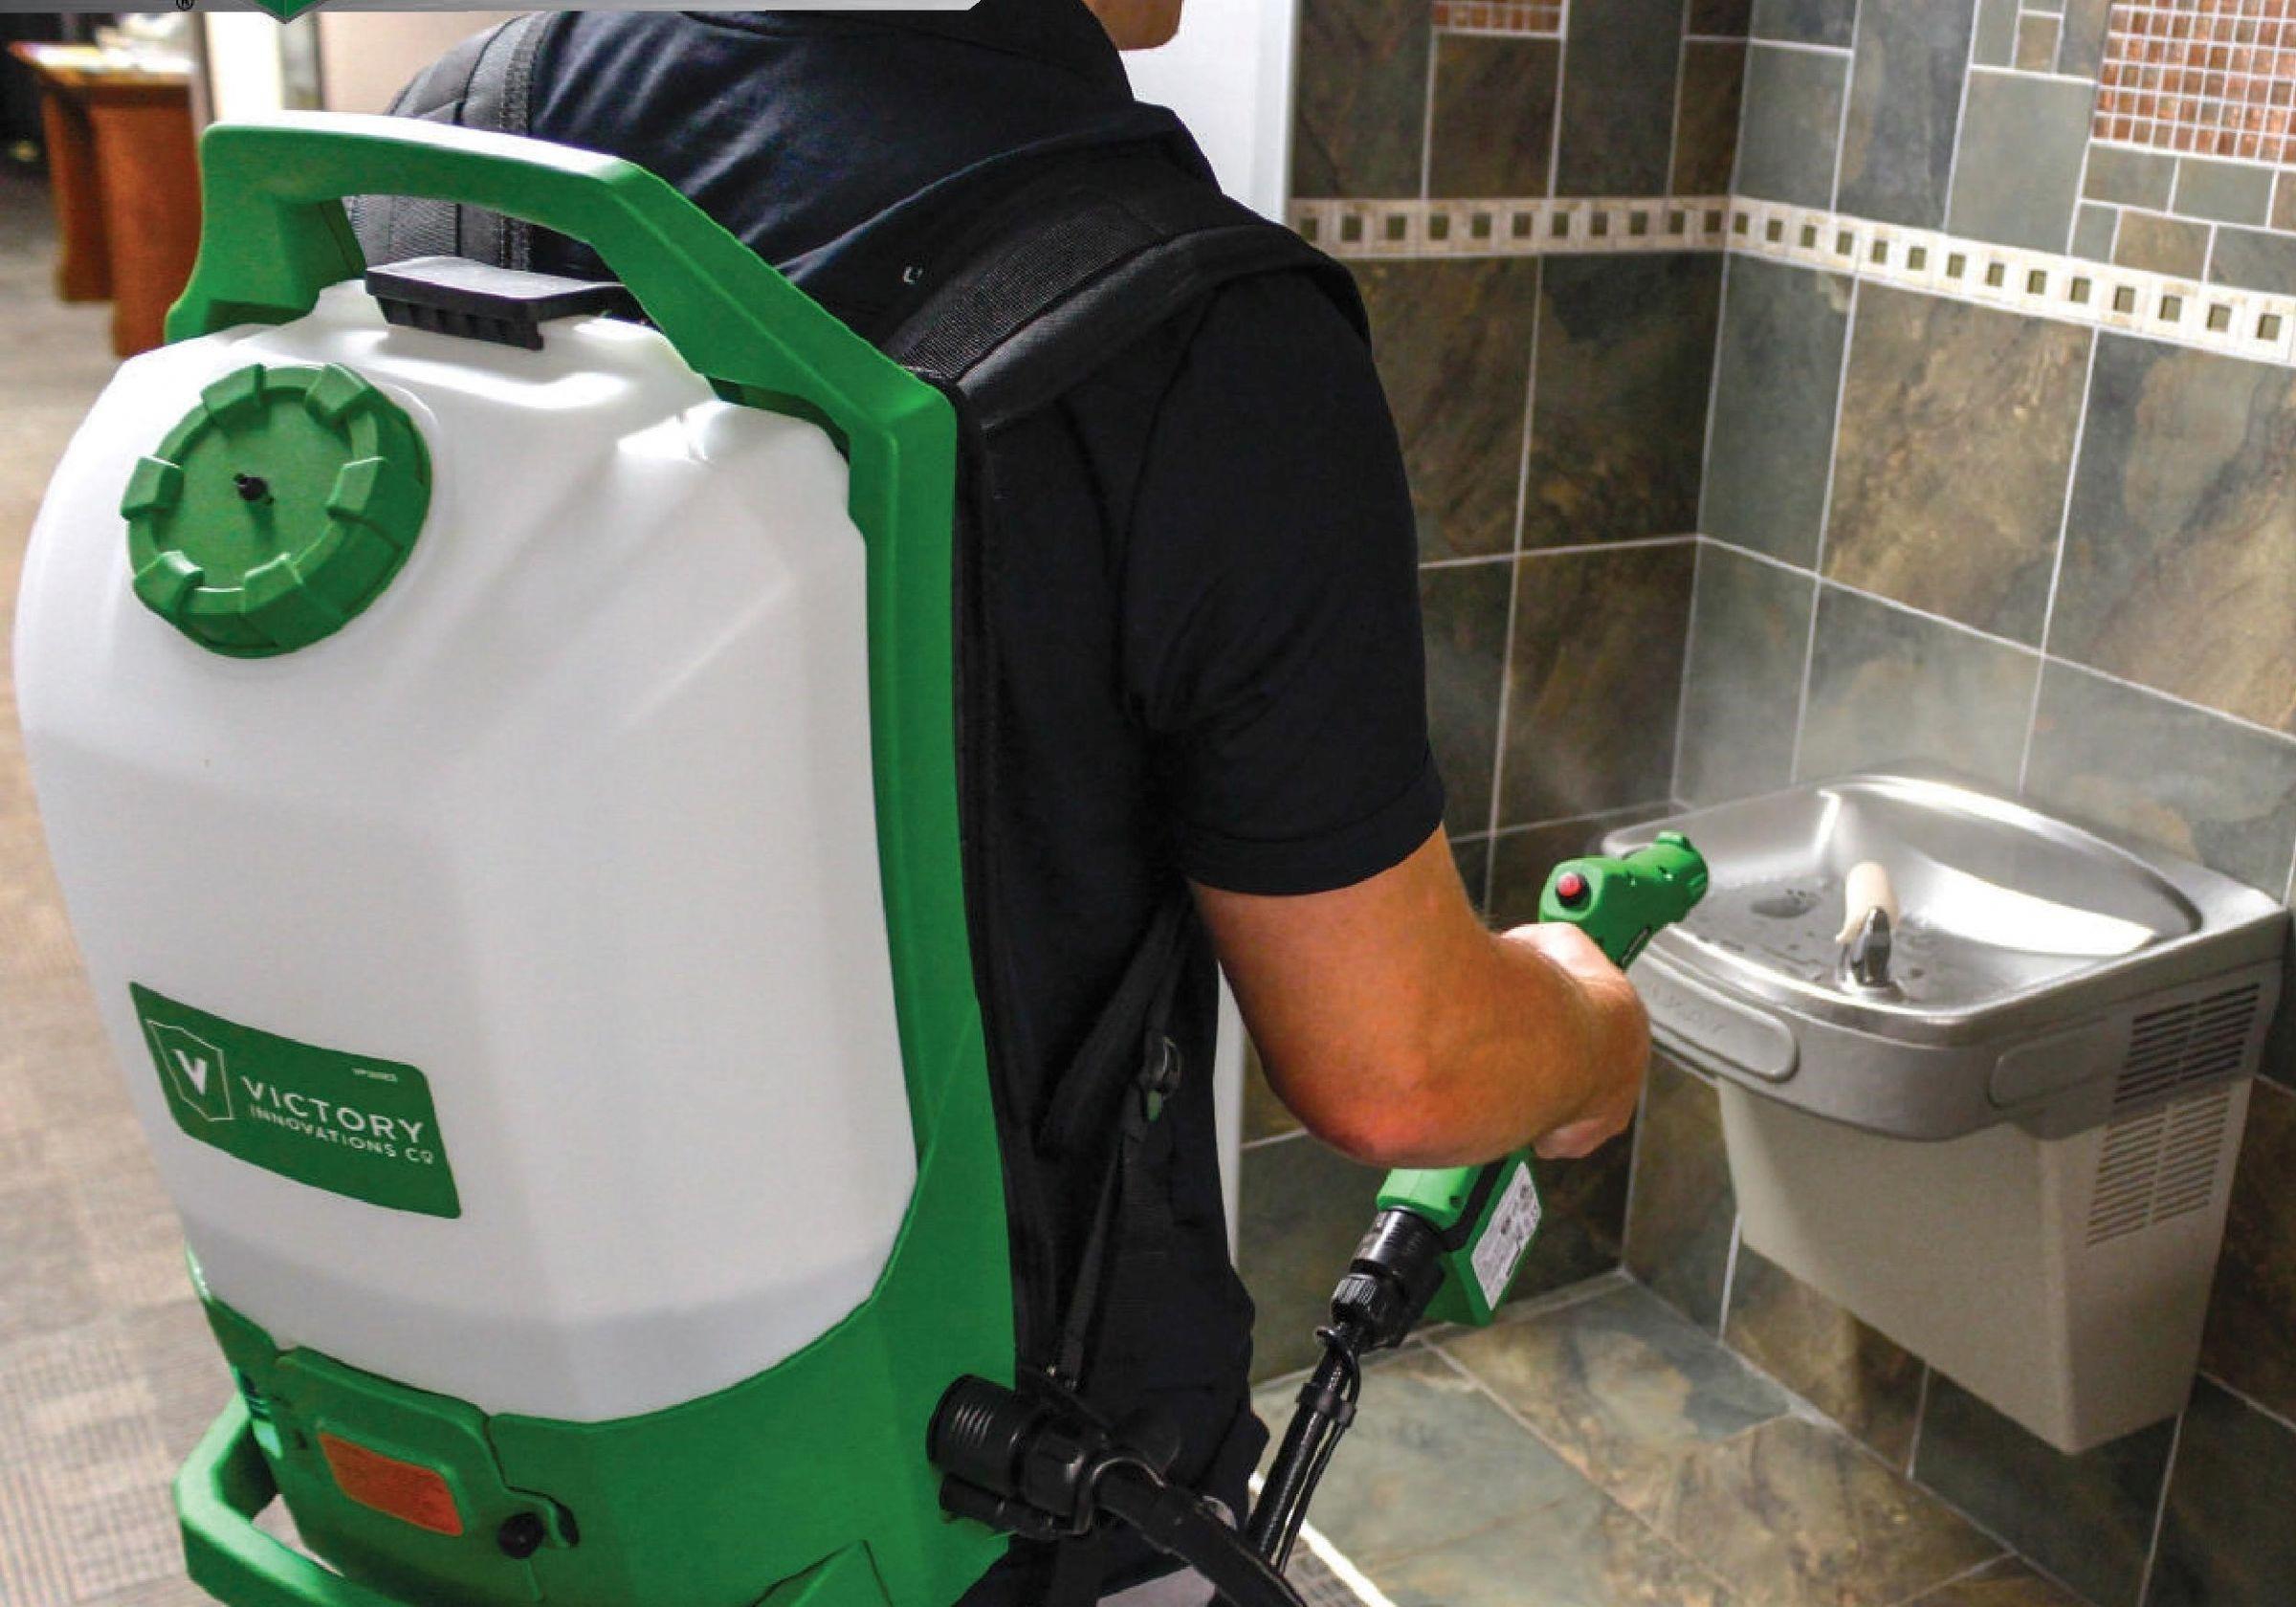 Professional Cordless Electrostatic Sprayer - Handheld and